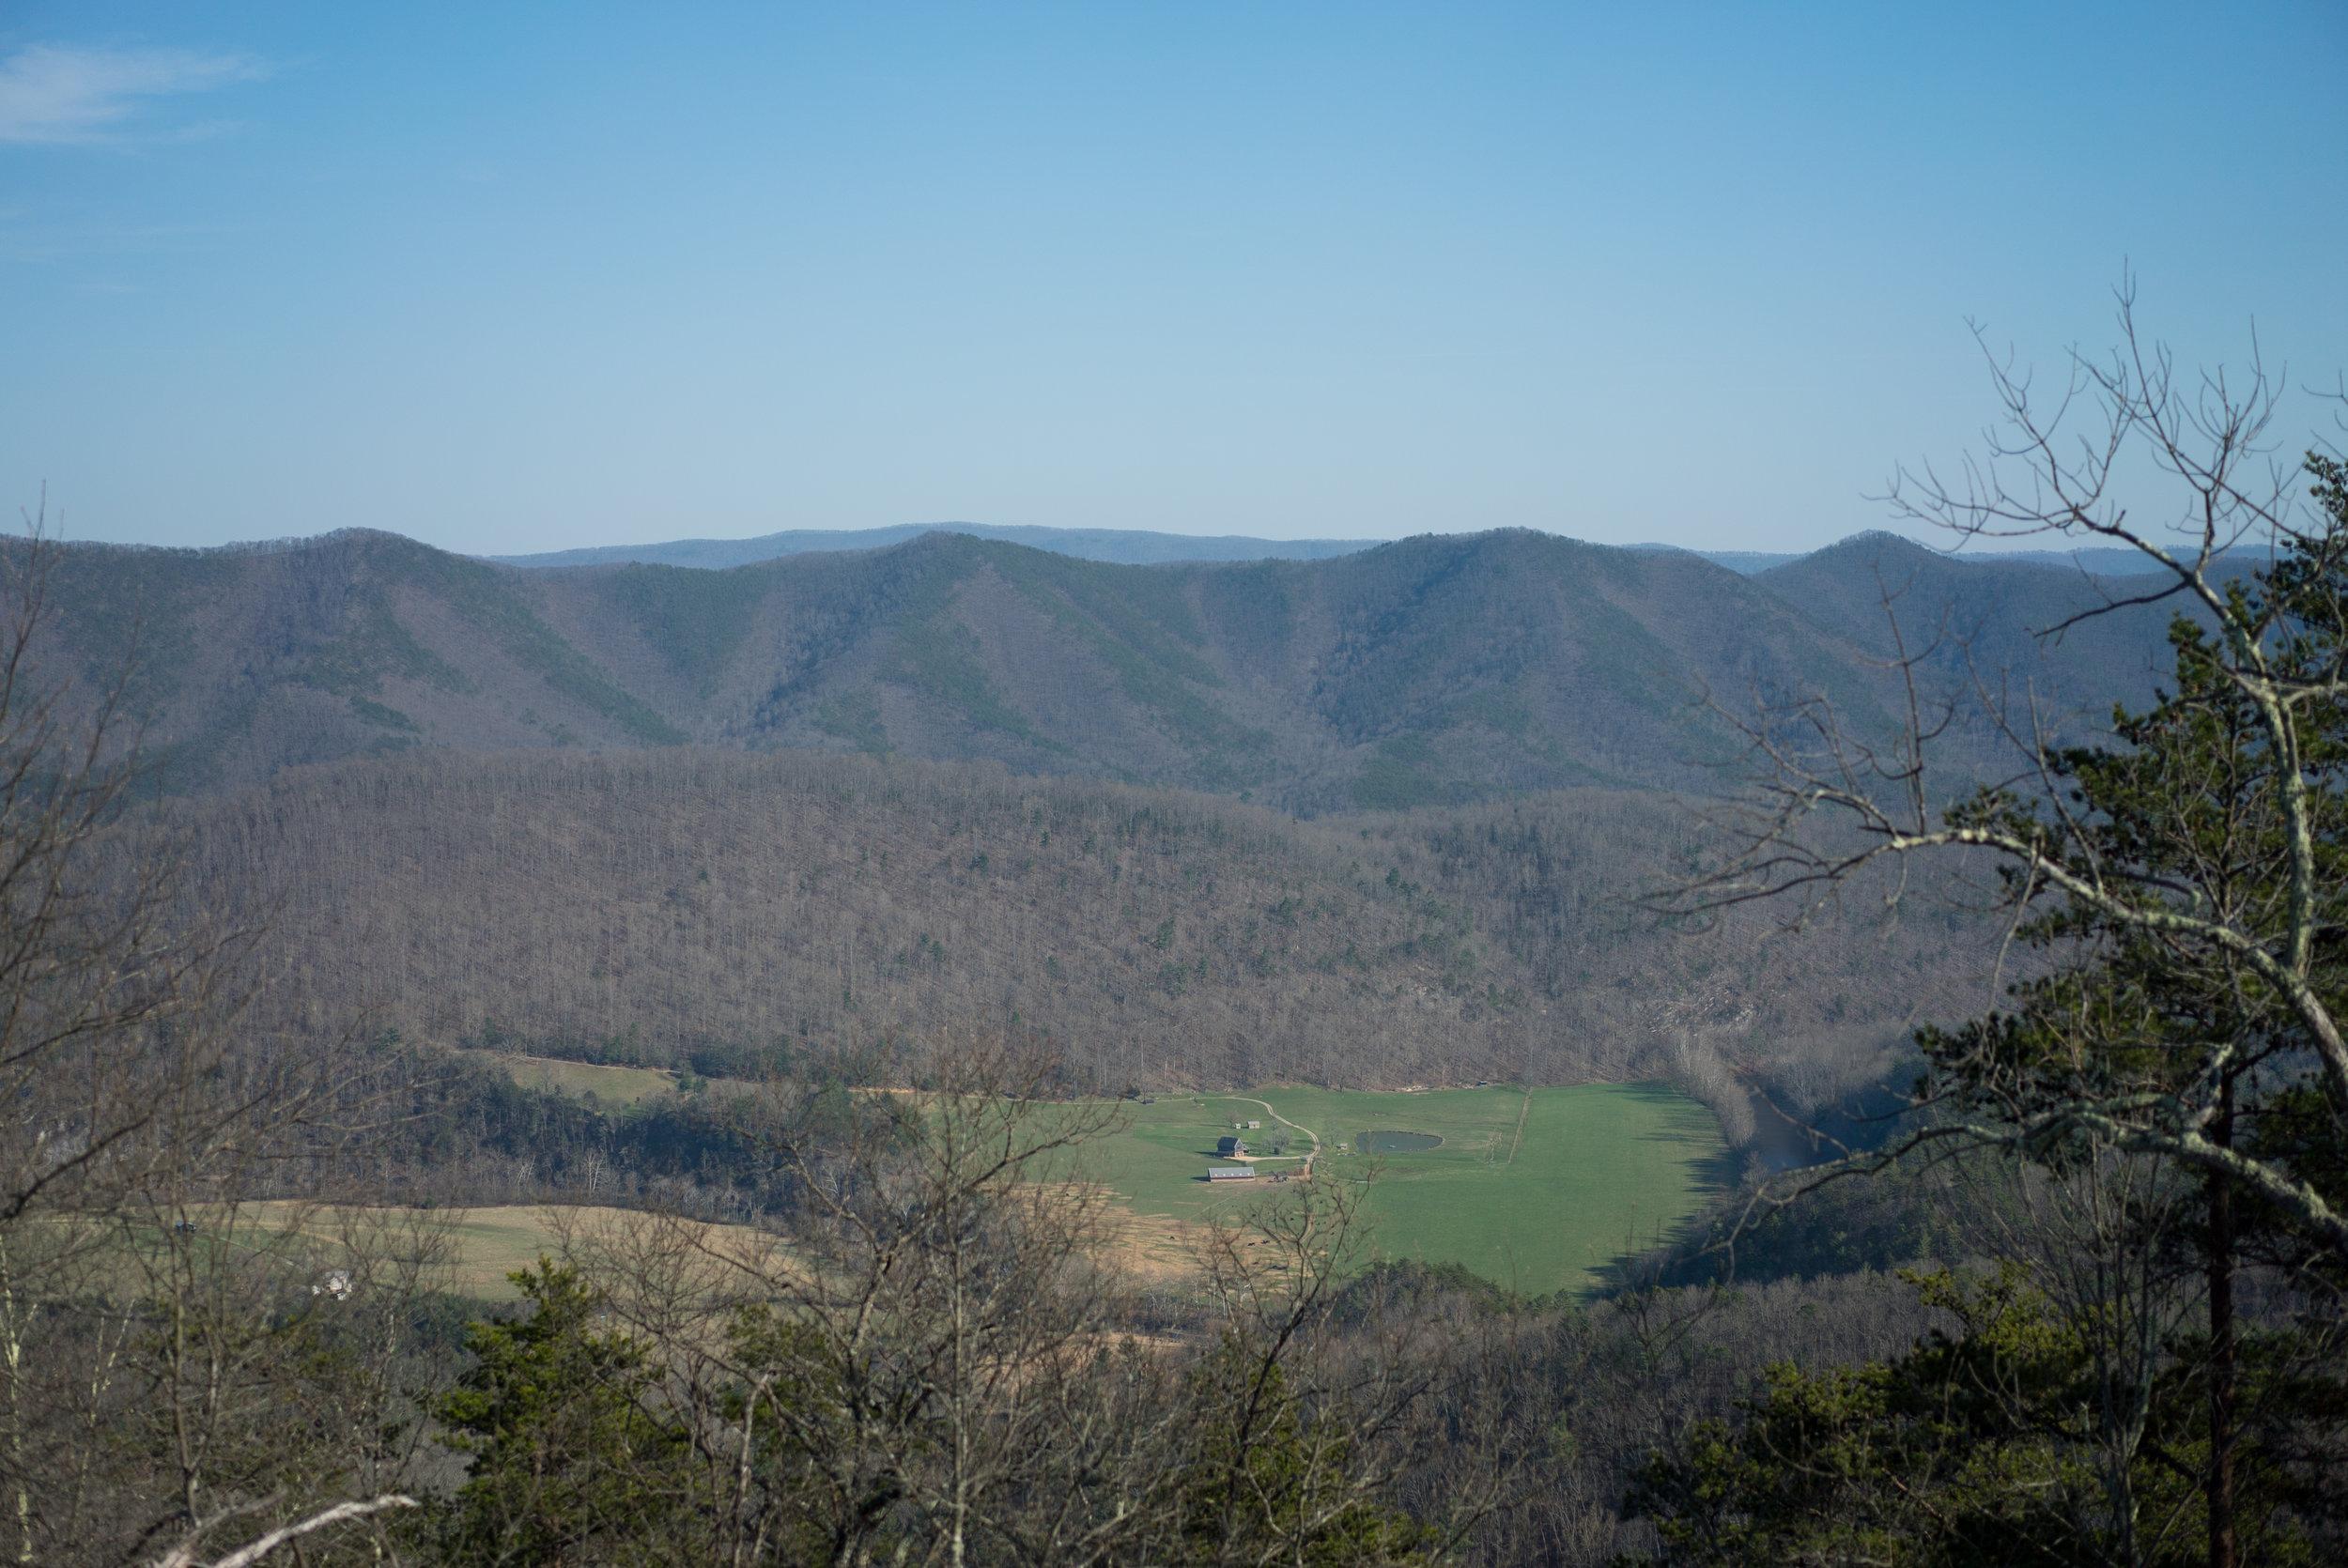 Rewarding view near the end of Beards Mountain